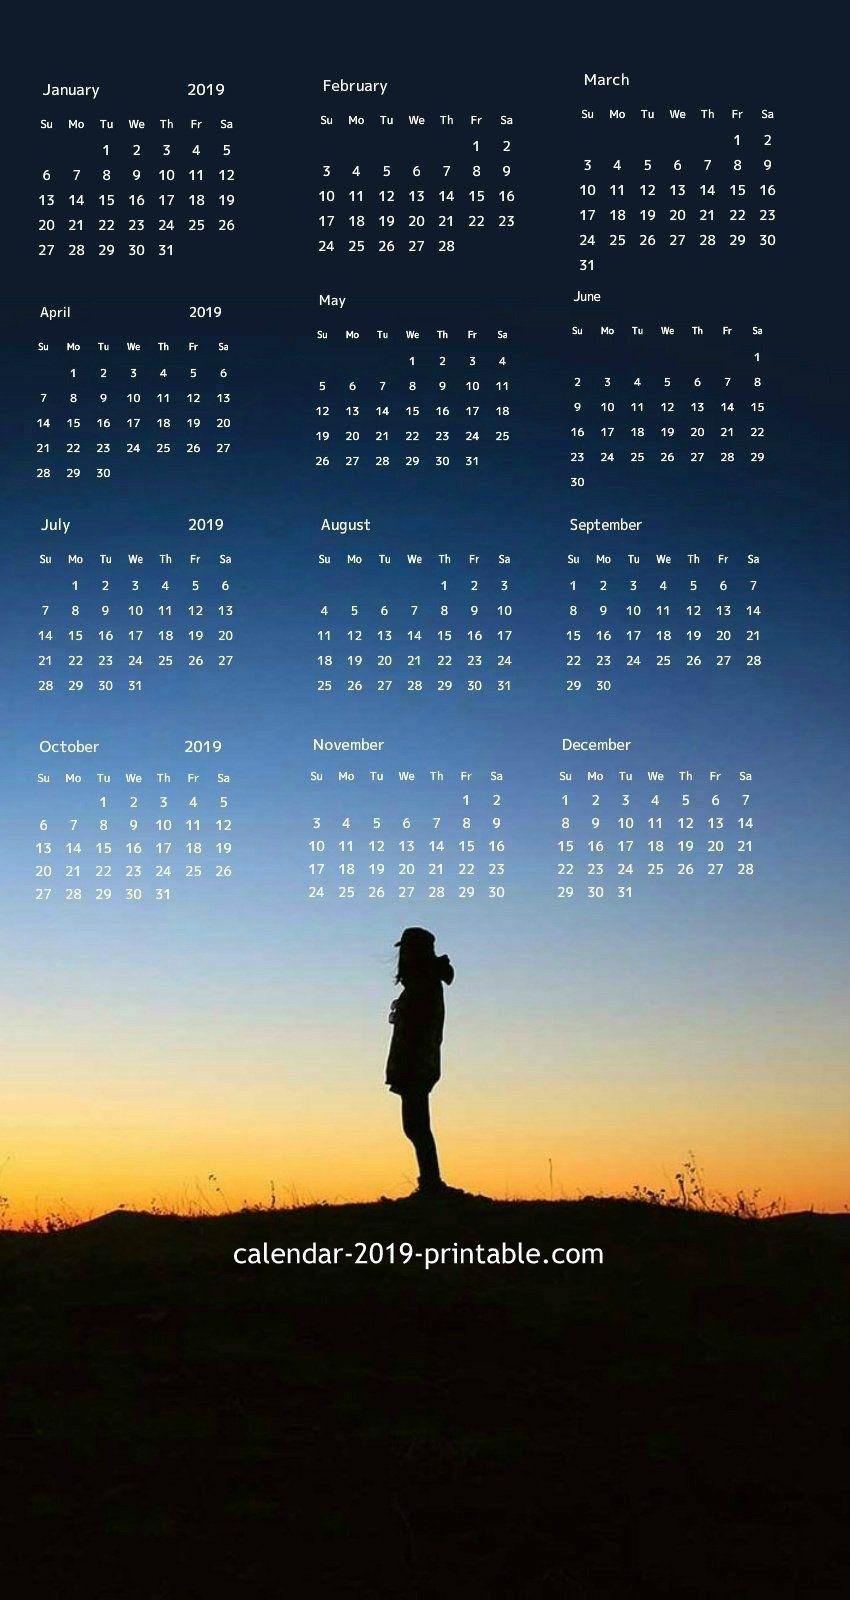 2019 Iphone Calendar Wallpaper | 2019 Calendars In 2019